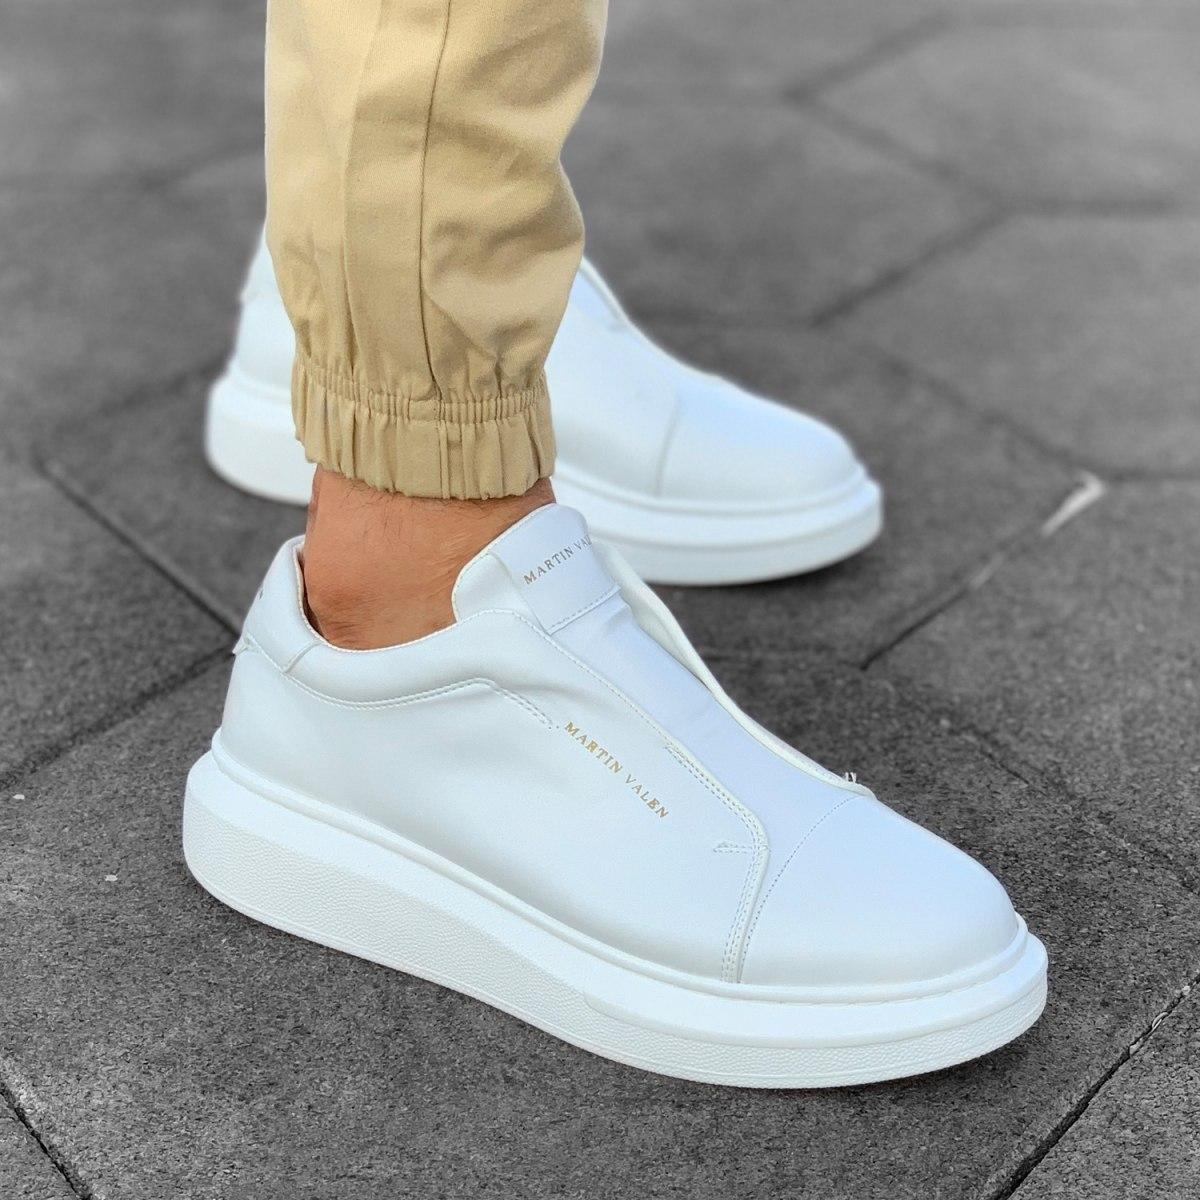 Slip-on Sneakers in White